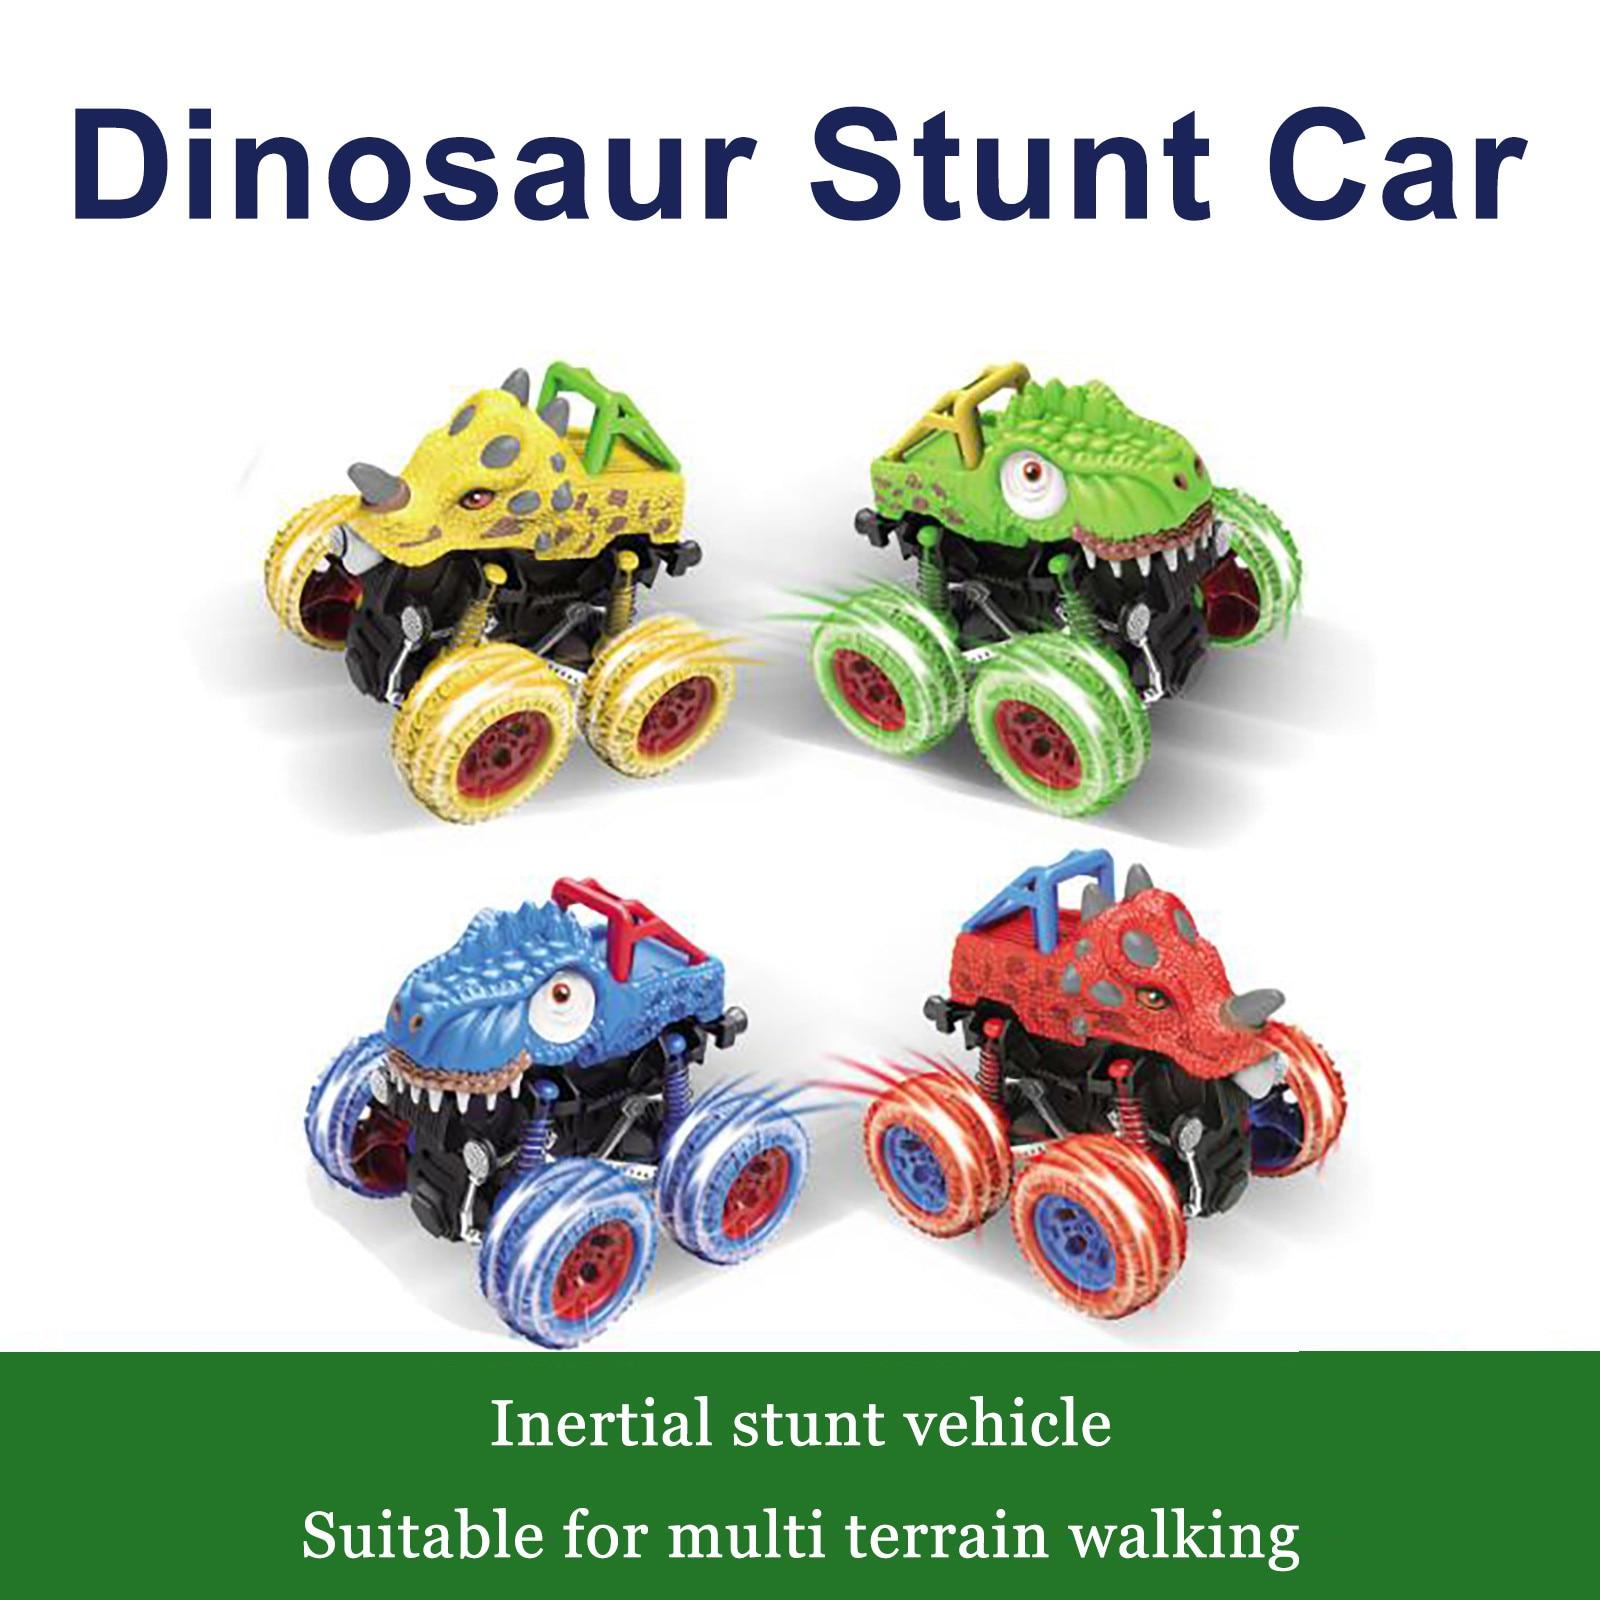 Creative Pull Back Press Dinosaur Toy Car Cartoon Animal Clockwork Children's Toy Non-toxic Colored Animal Vehicles Toys #10